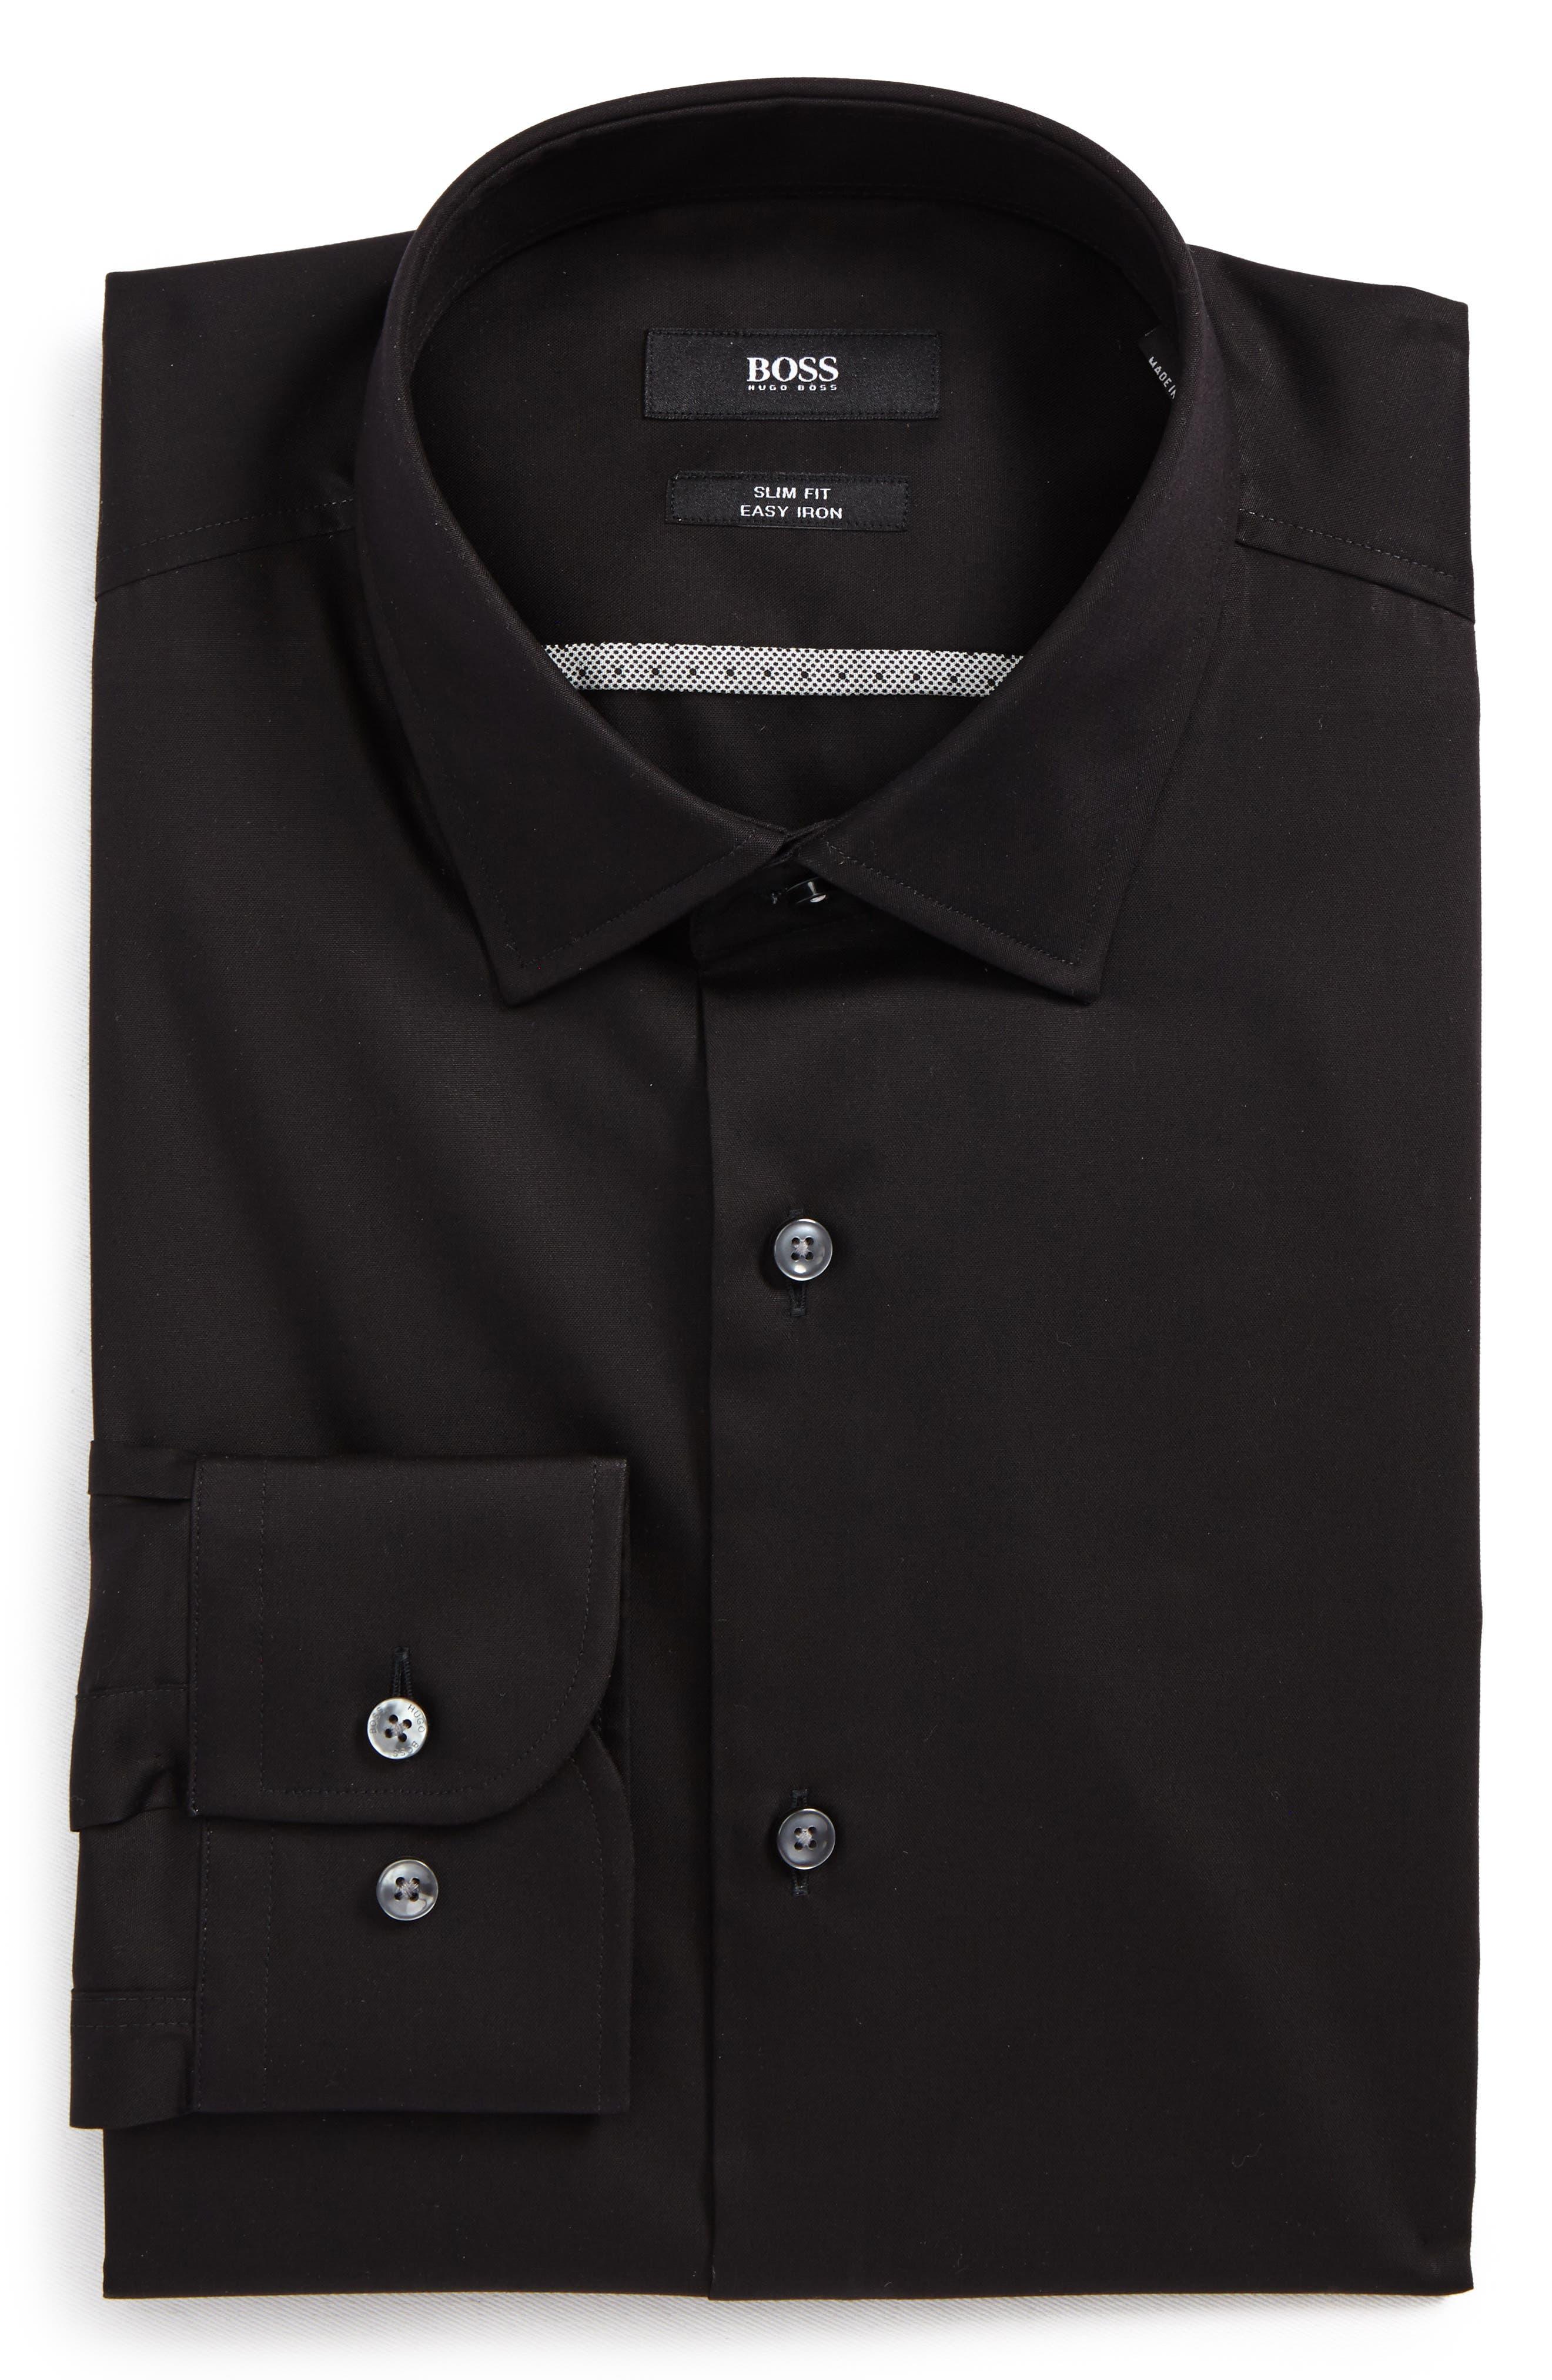 Main Image - BOSS Jerris Slim Fit Dress Shirt